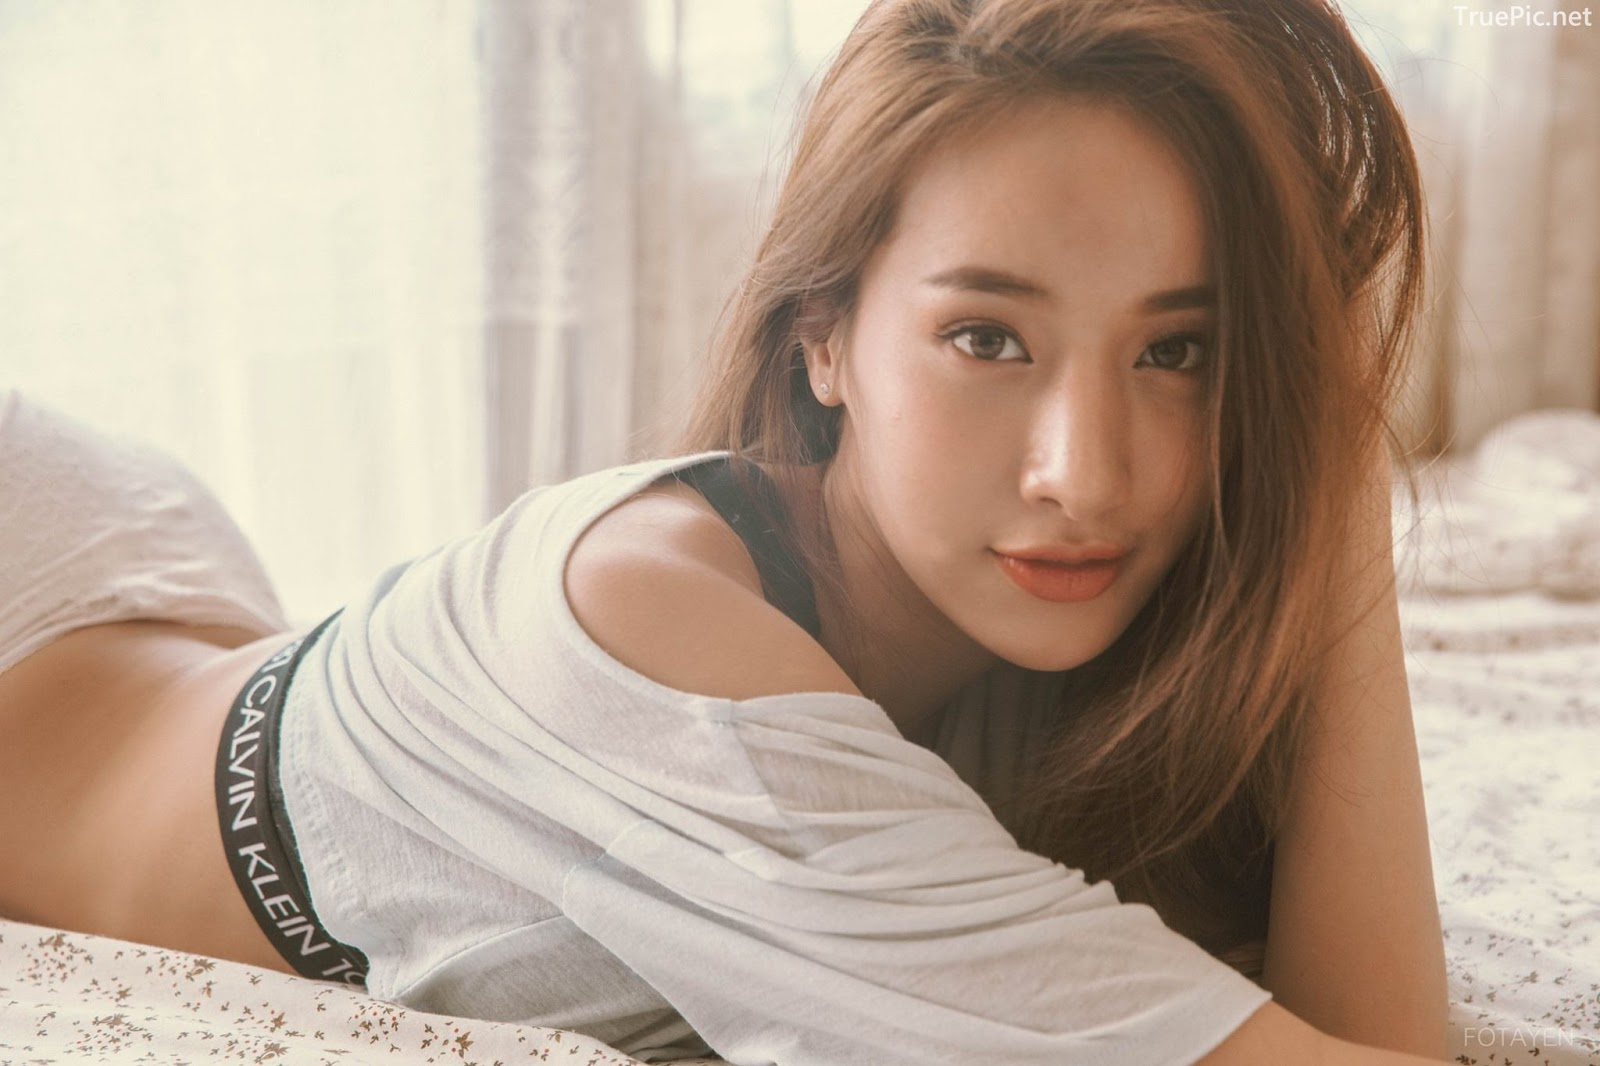 Pichana-Yoosuk-Thailand-hot-model-Good-morning-angel-TruePic.net- Picture-1